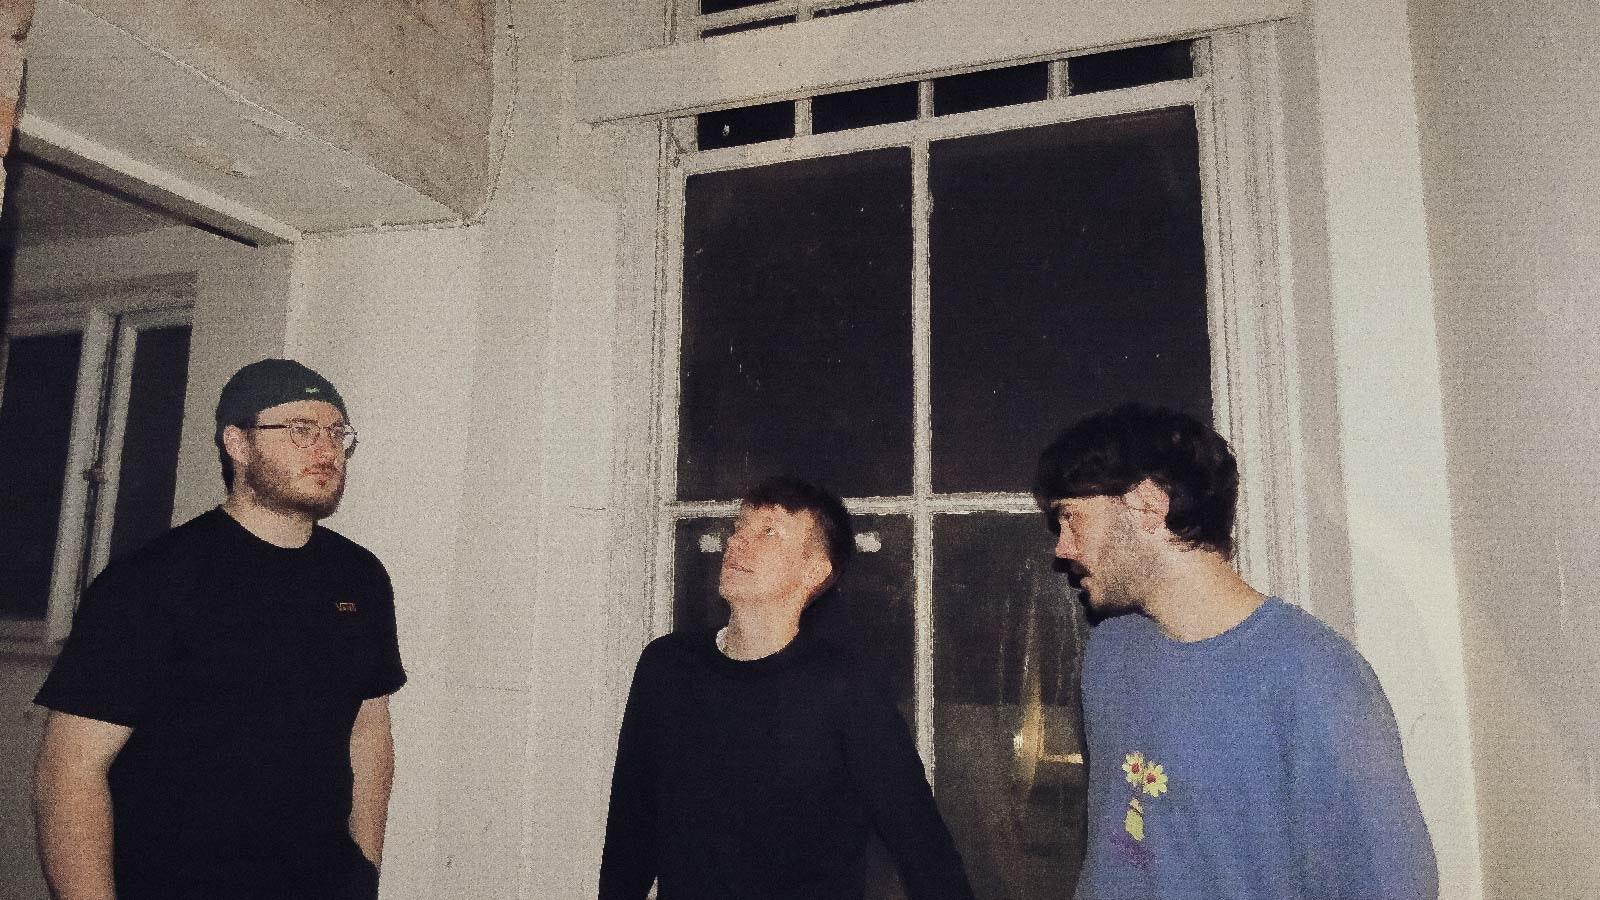 Chncer | Manchester, Gullivers